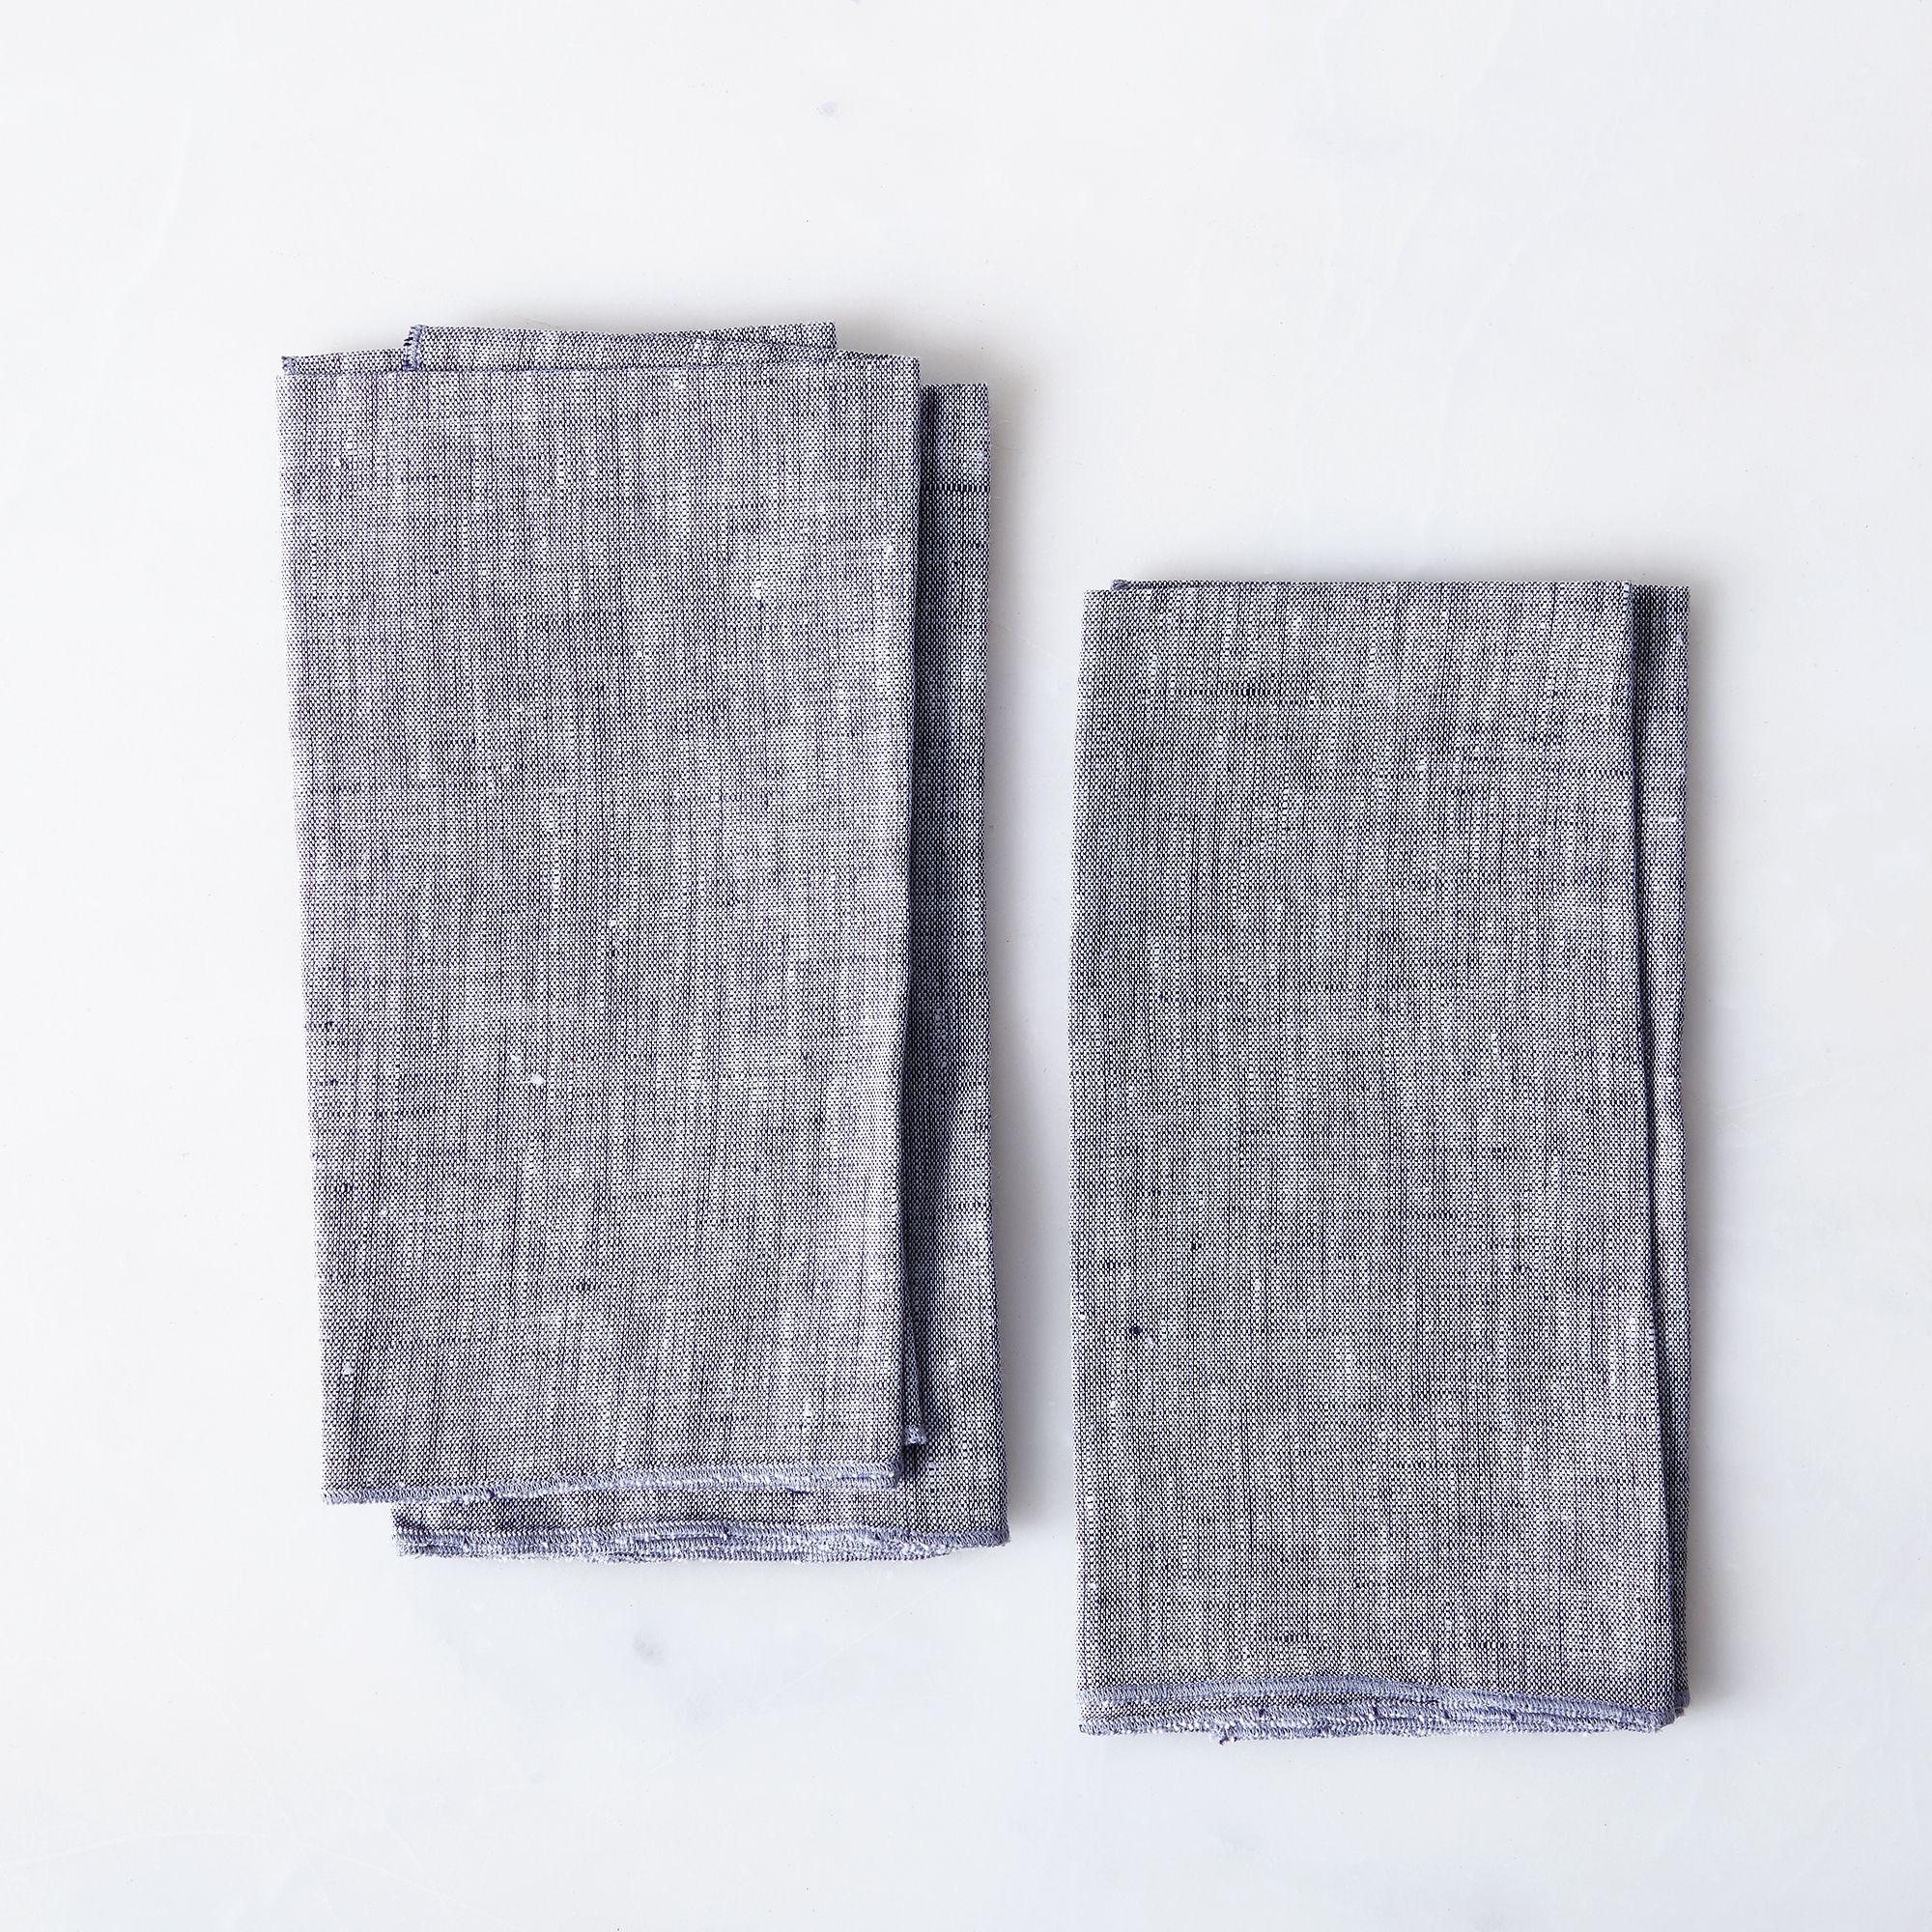 C315b1f5 56fd 4e79 aedd 28103dd8fb33  2016 1028 objective linen chambray napkins set of 4 charcoal silo rocky luten 052